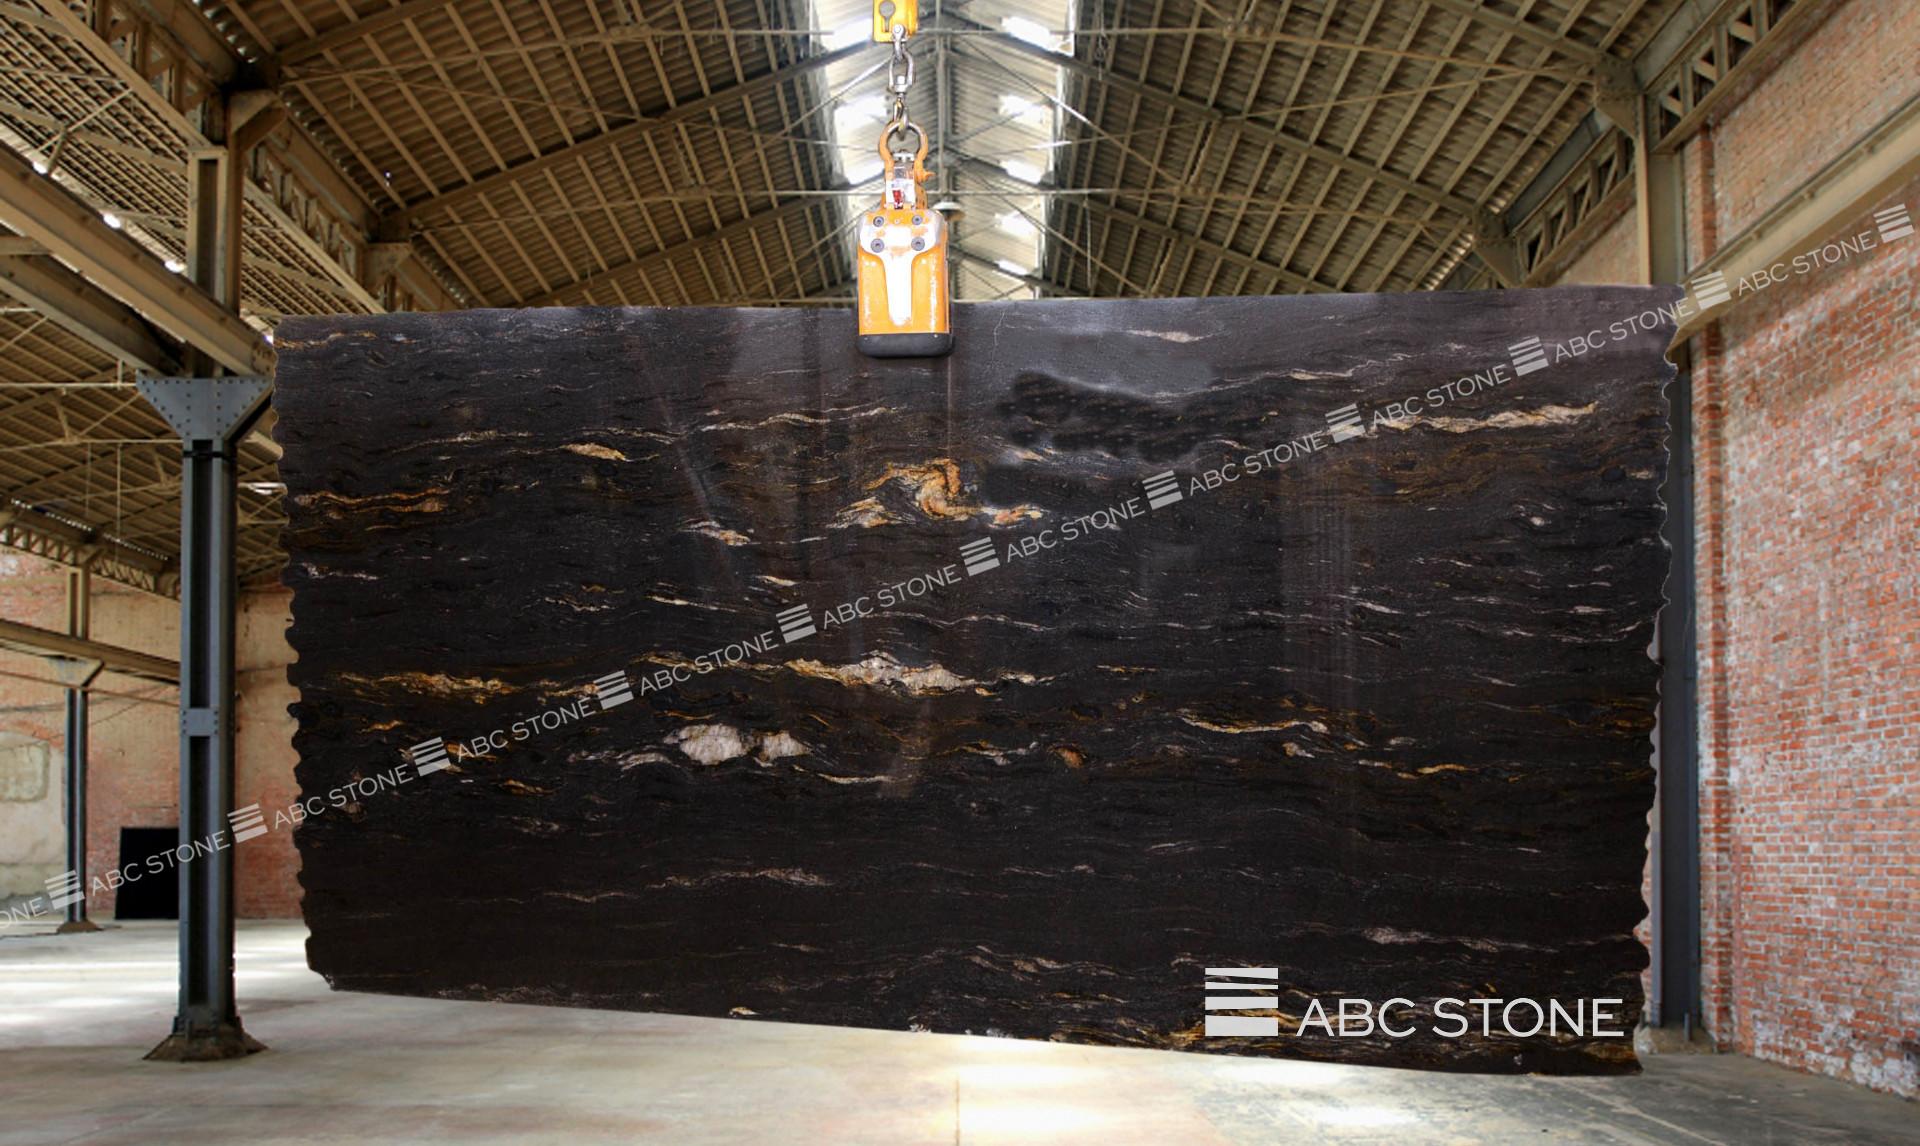 Cosmic Black - ABC Stone : ABC Stone